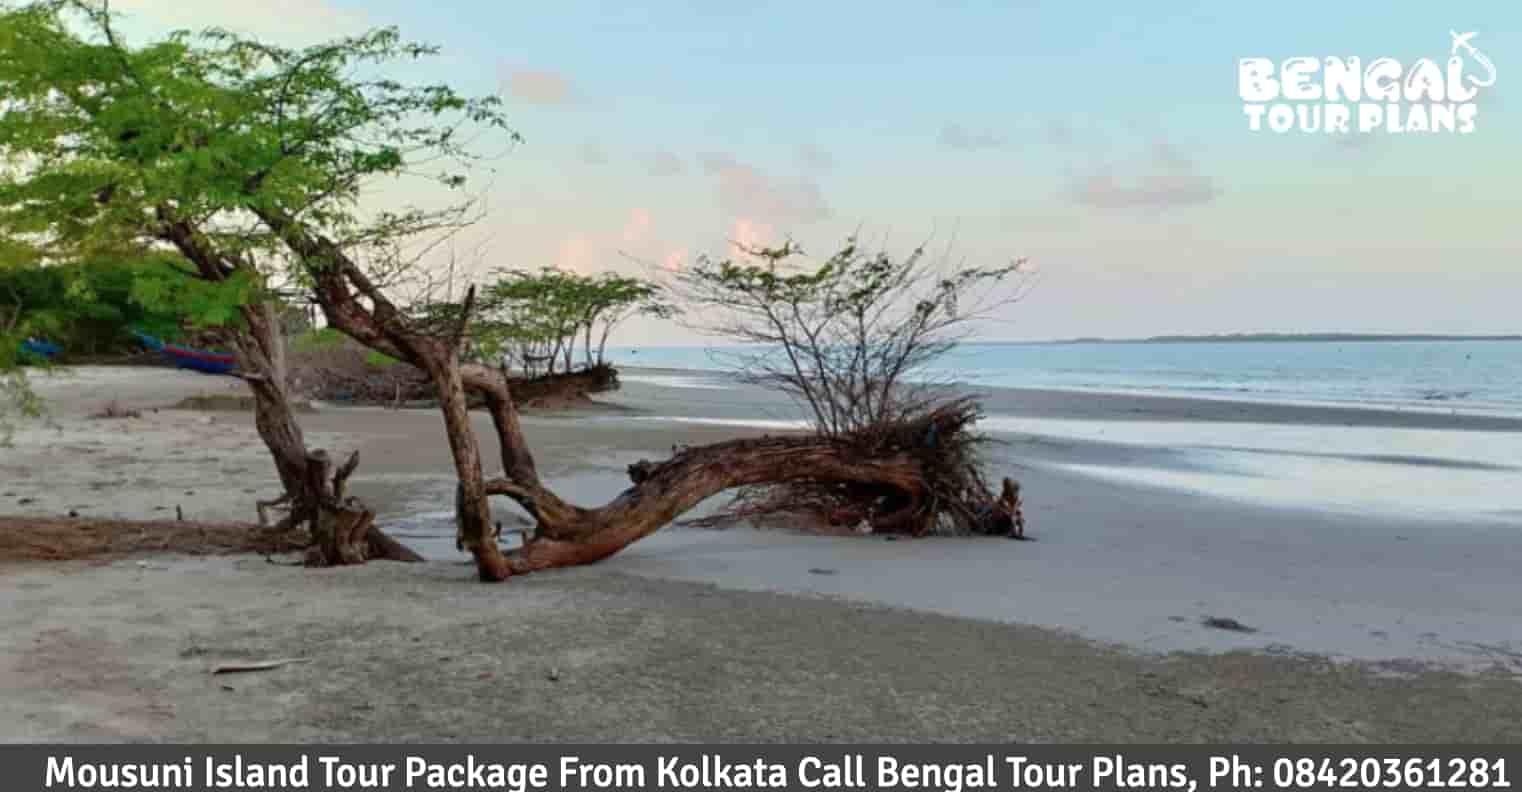 Mousuni Island Tour From Kolkata